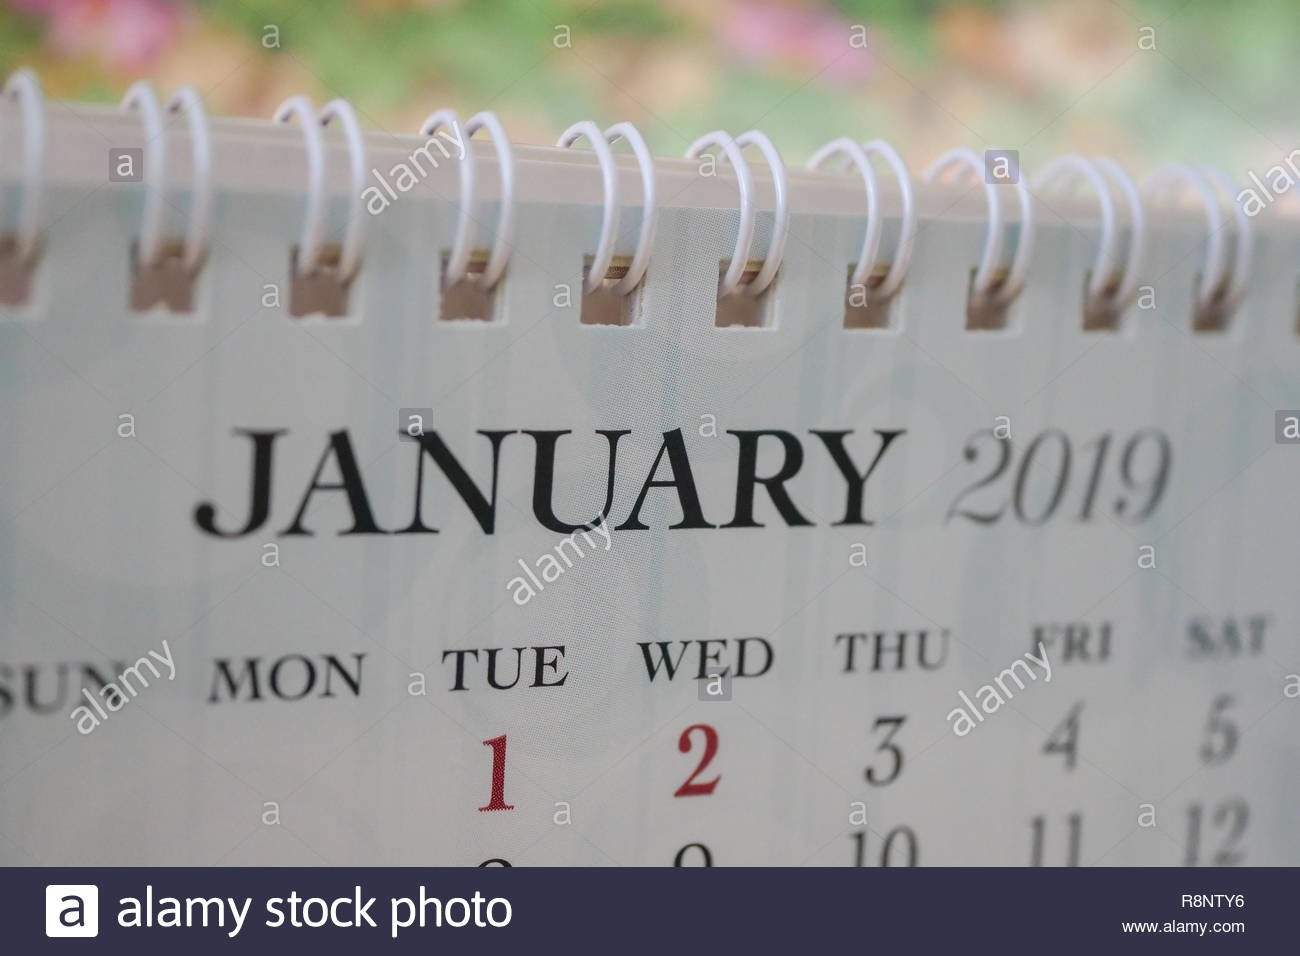 Close Up Calendar Of January 2019 Stock Photo: 229132602 – Alamy Calendar 2019 Bu